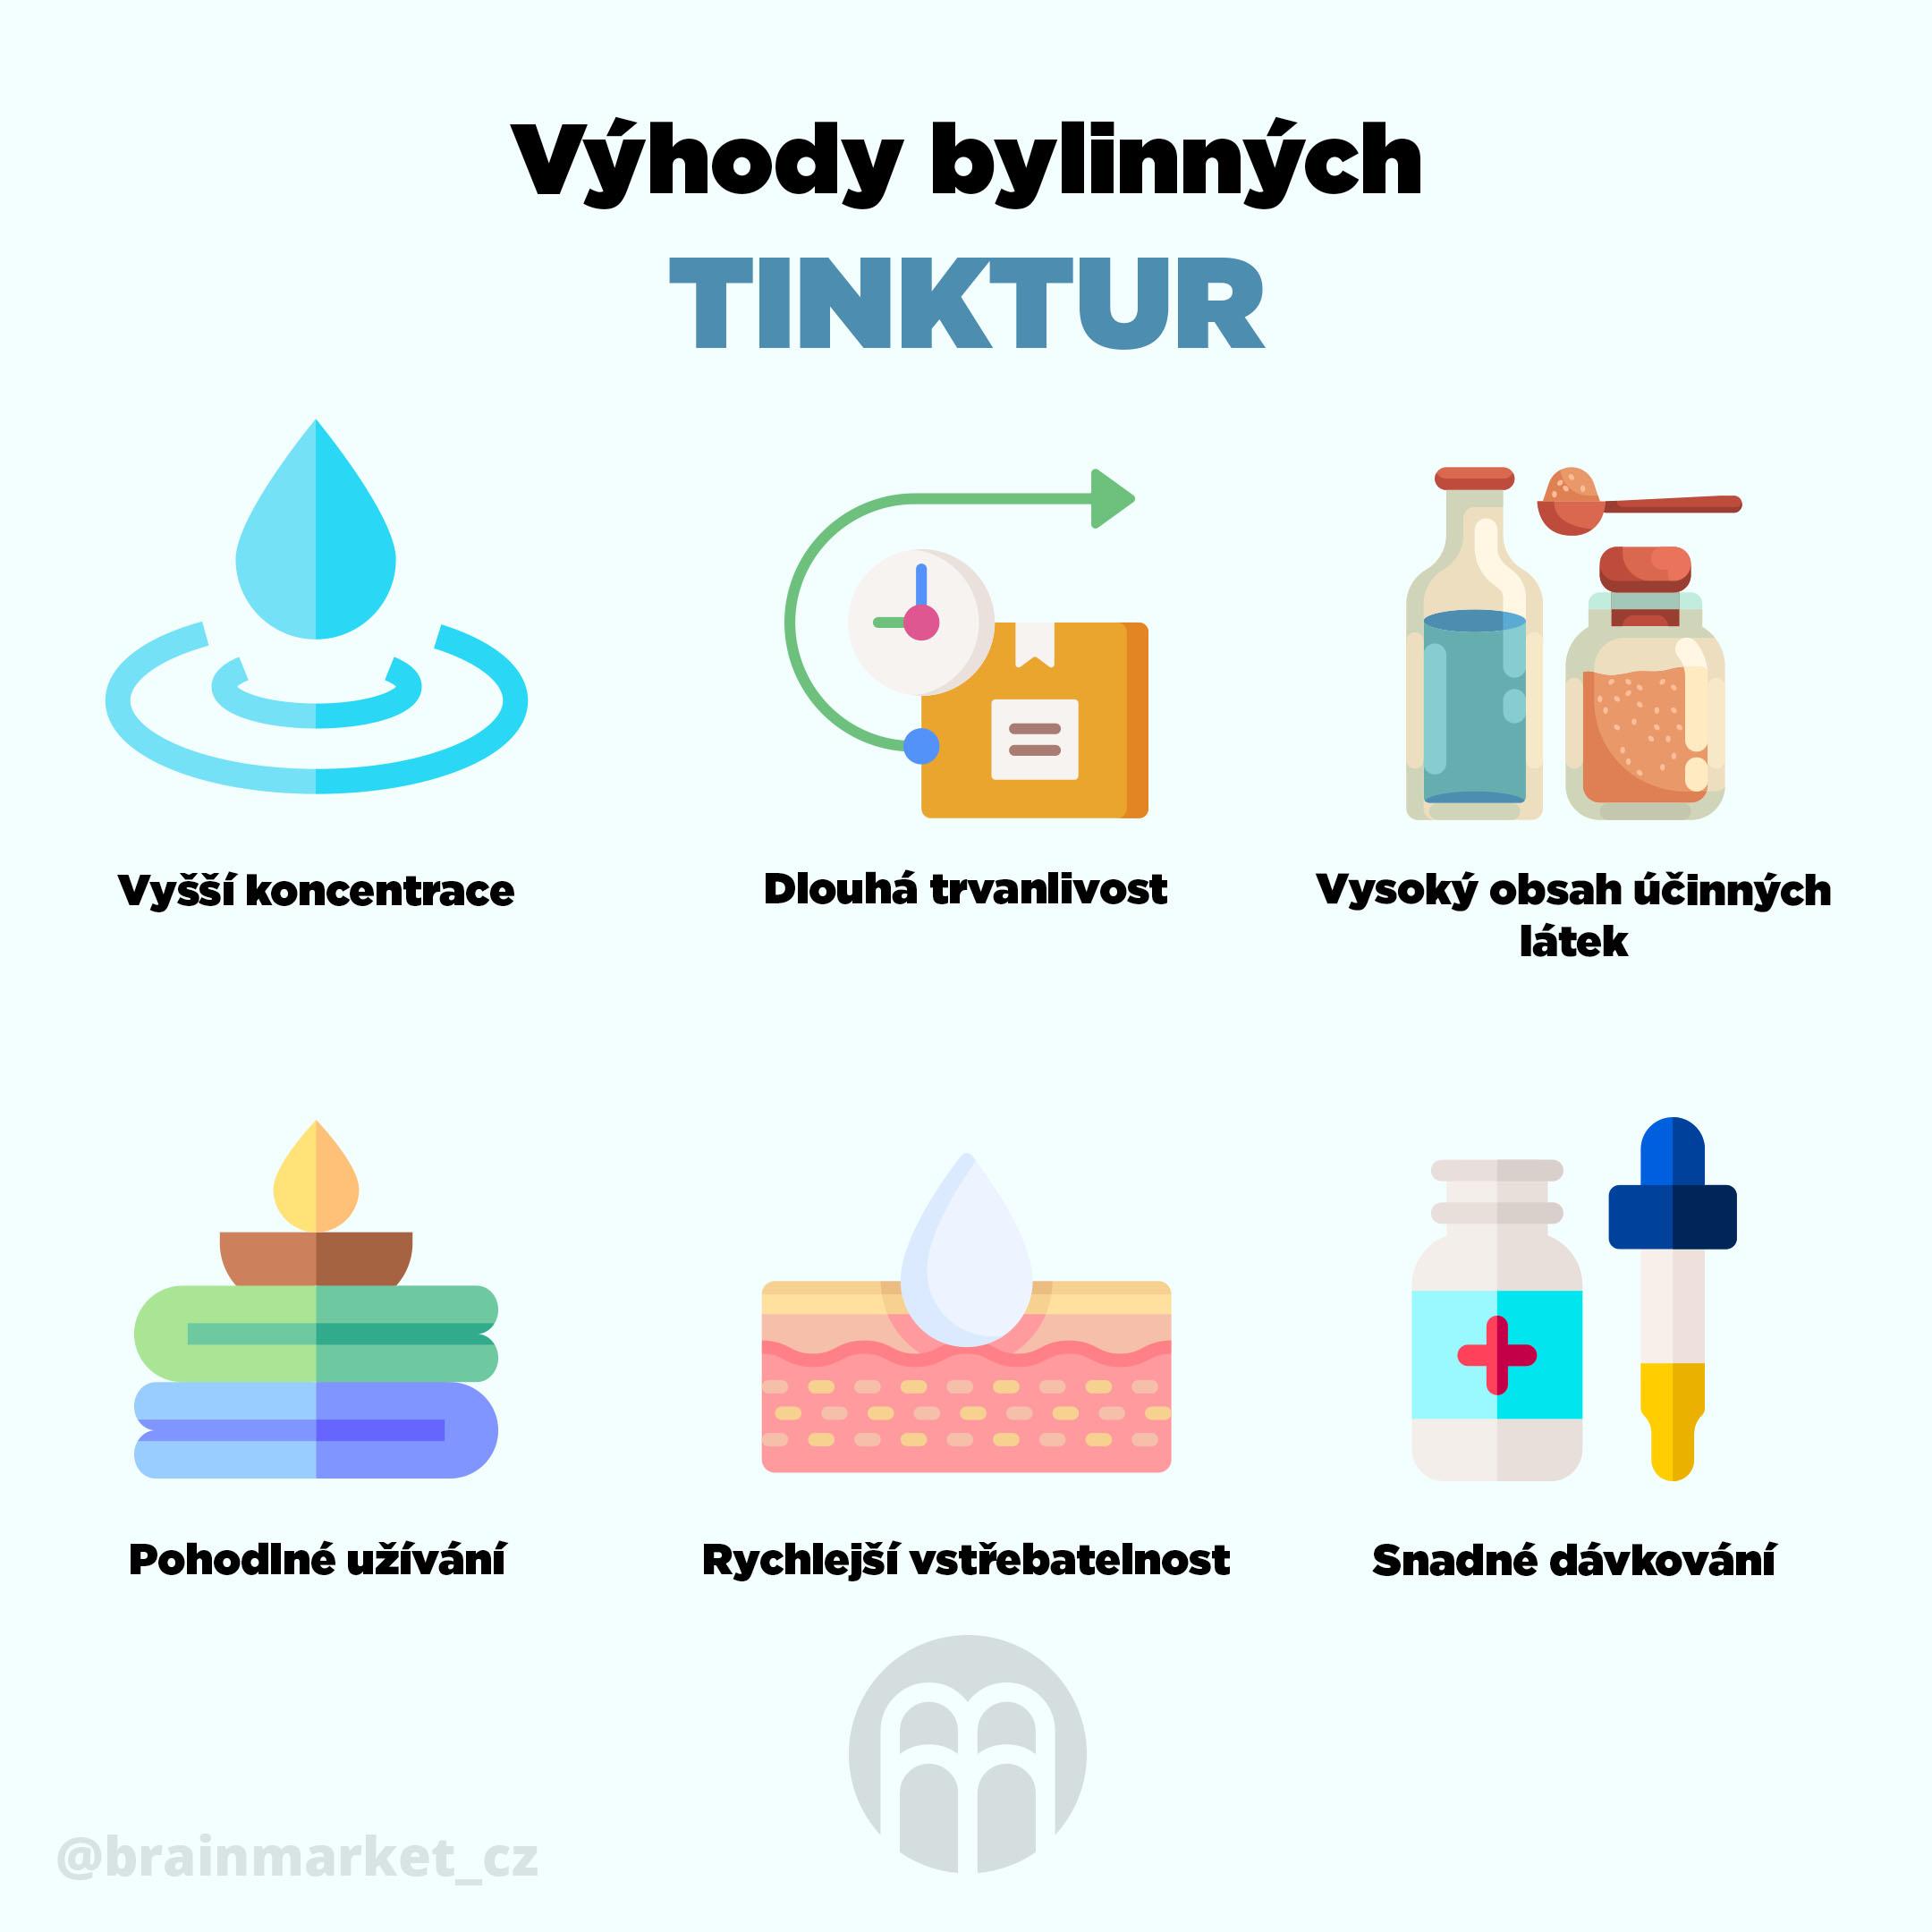 vyhody-byl-tinktur-infografika-brainmarket-cz